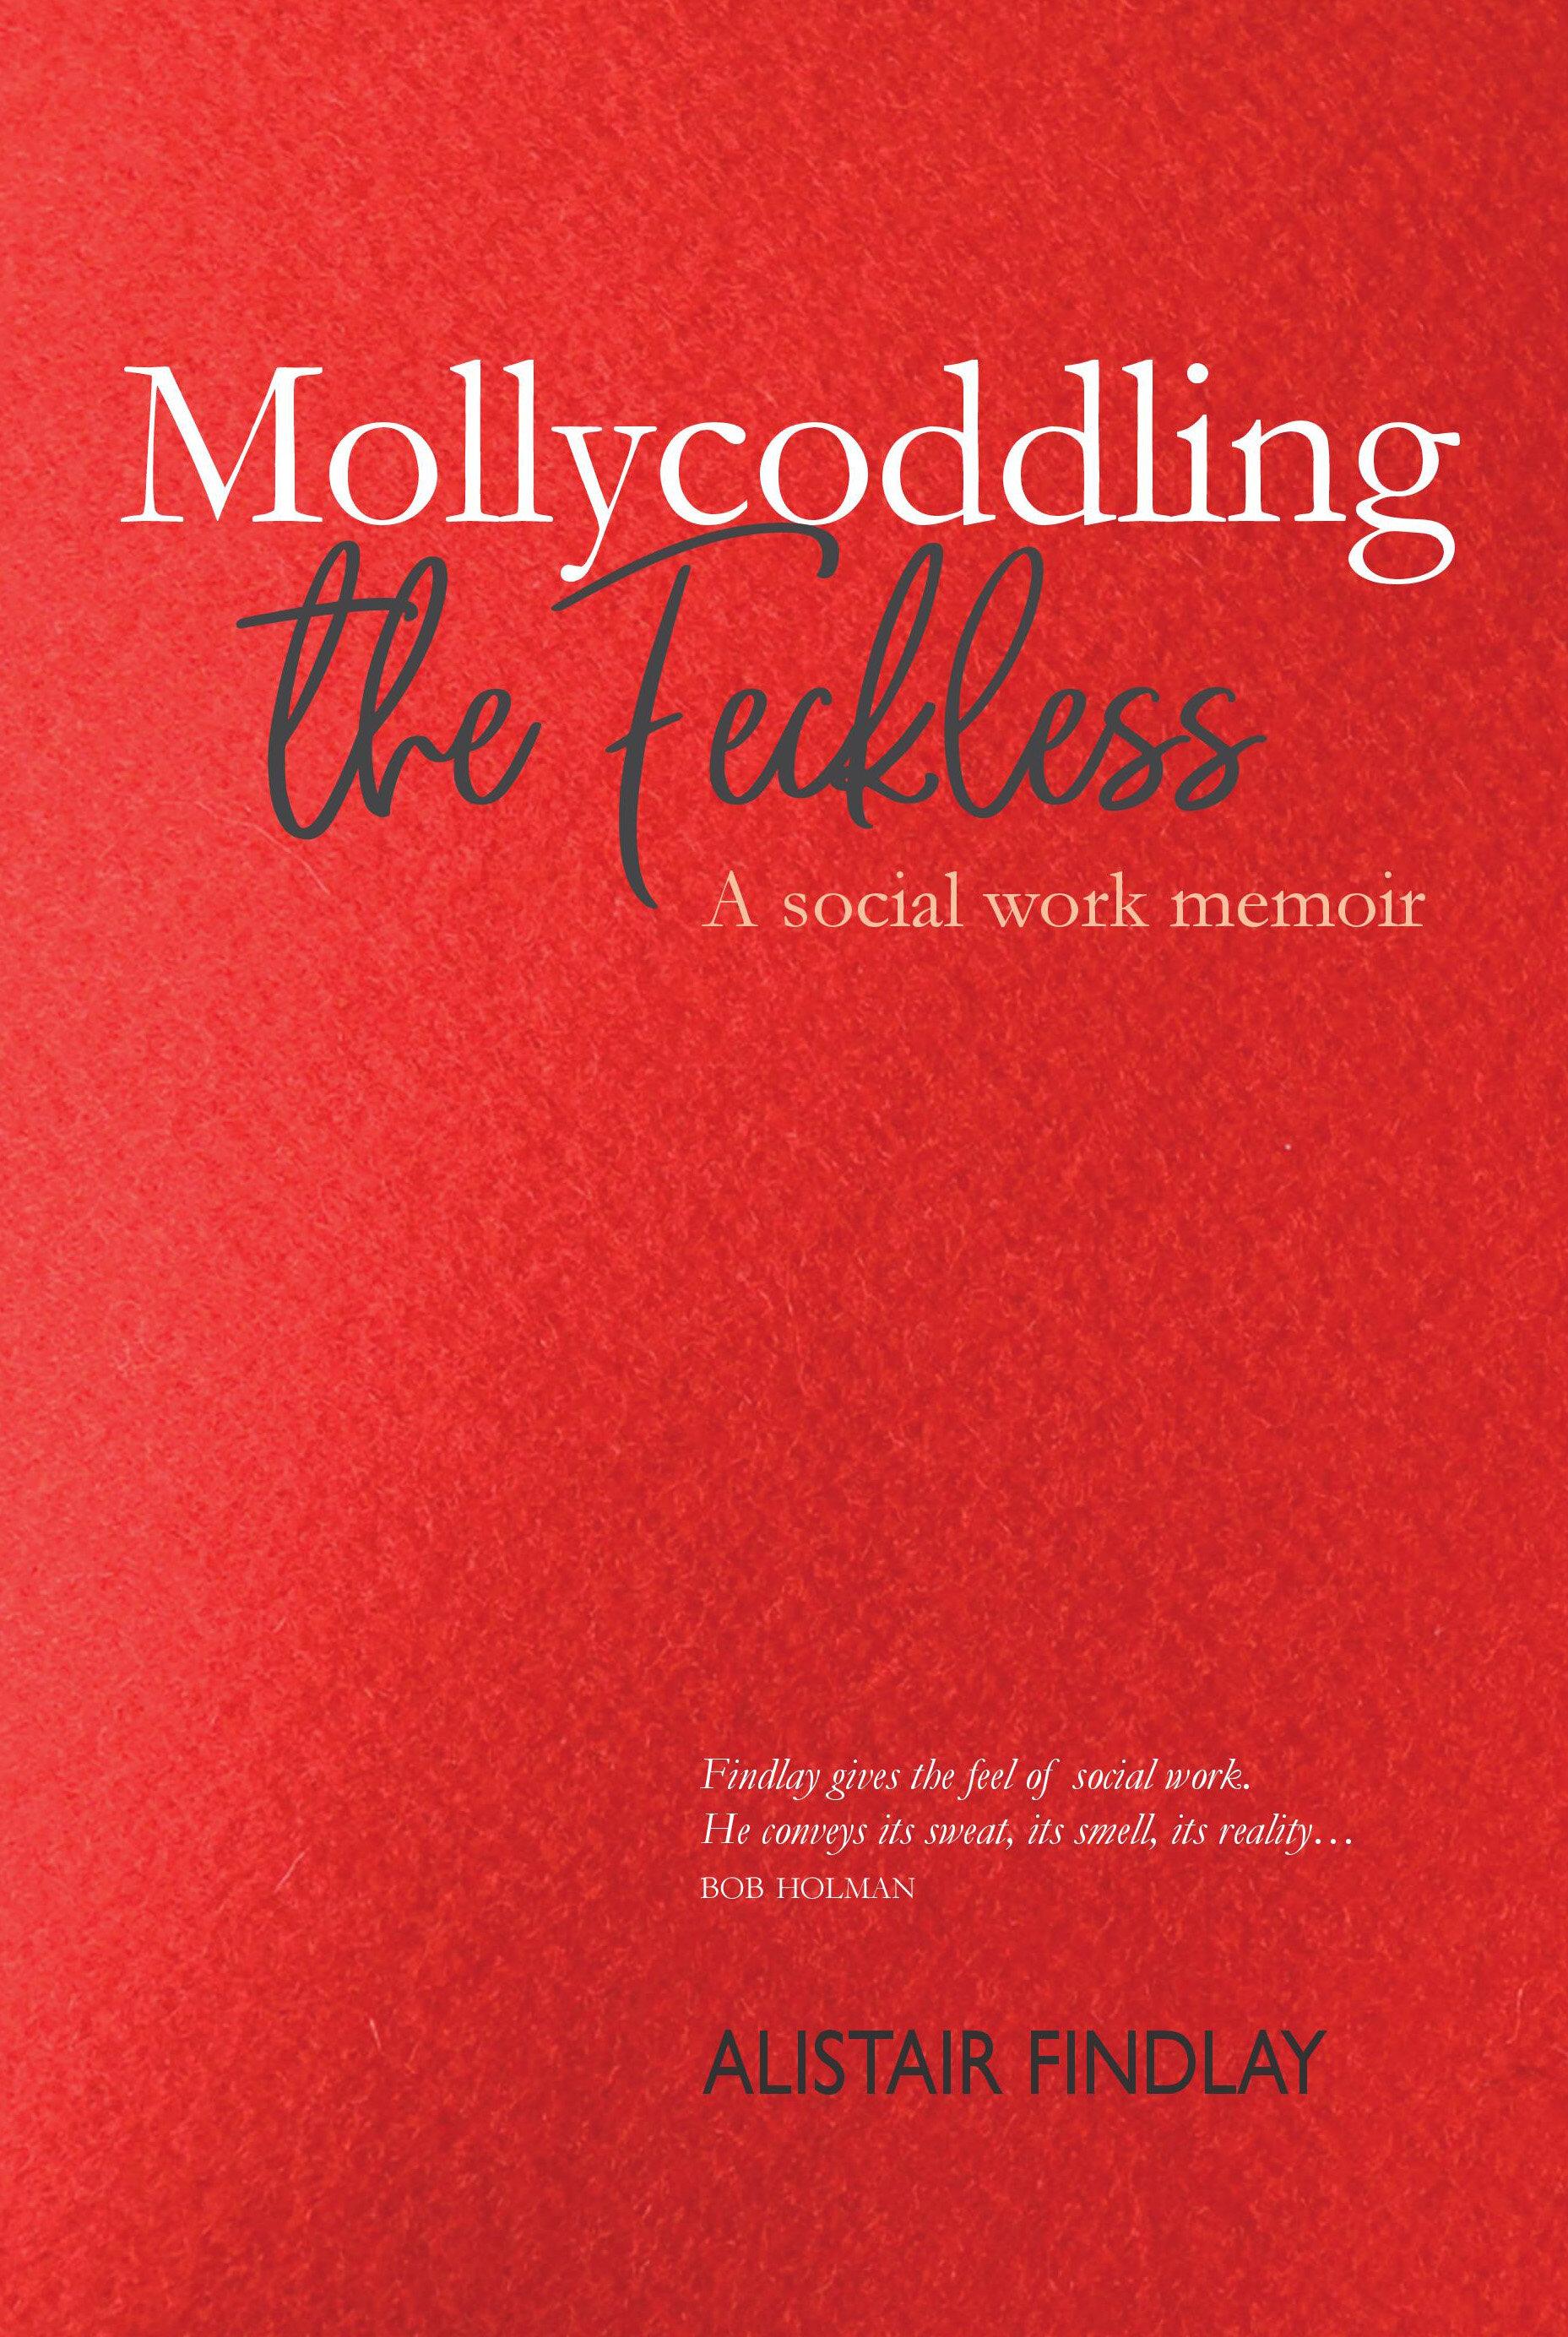 Mollycoddling the Feckless Alistair Findlay 9781913025076 Luath Press.jpg